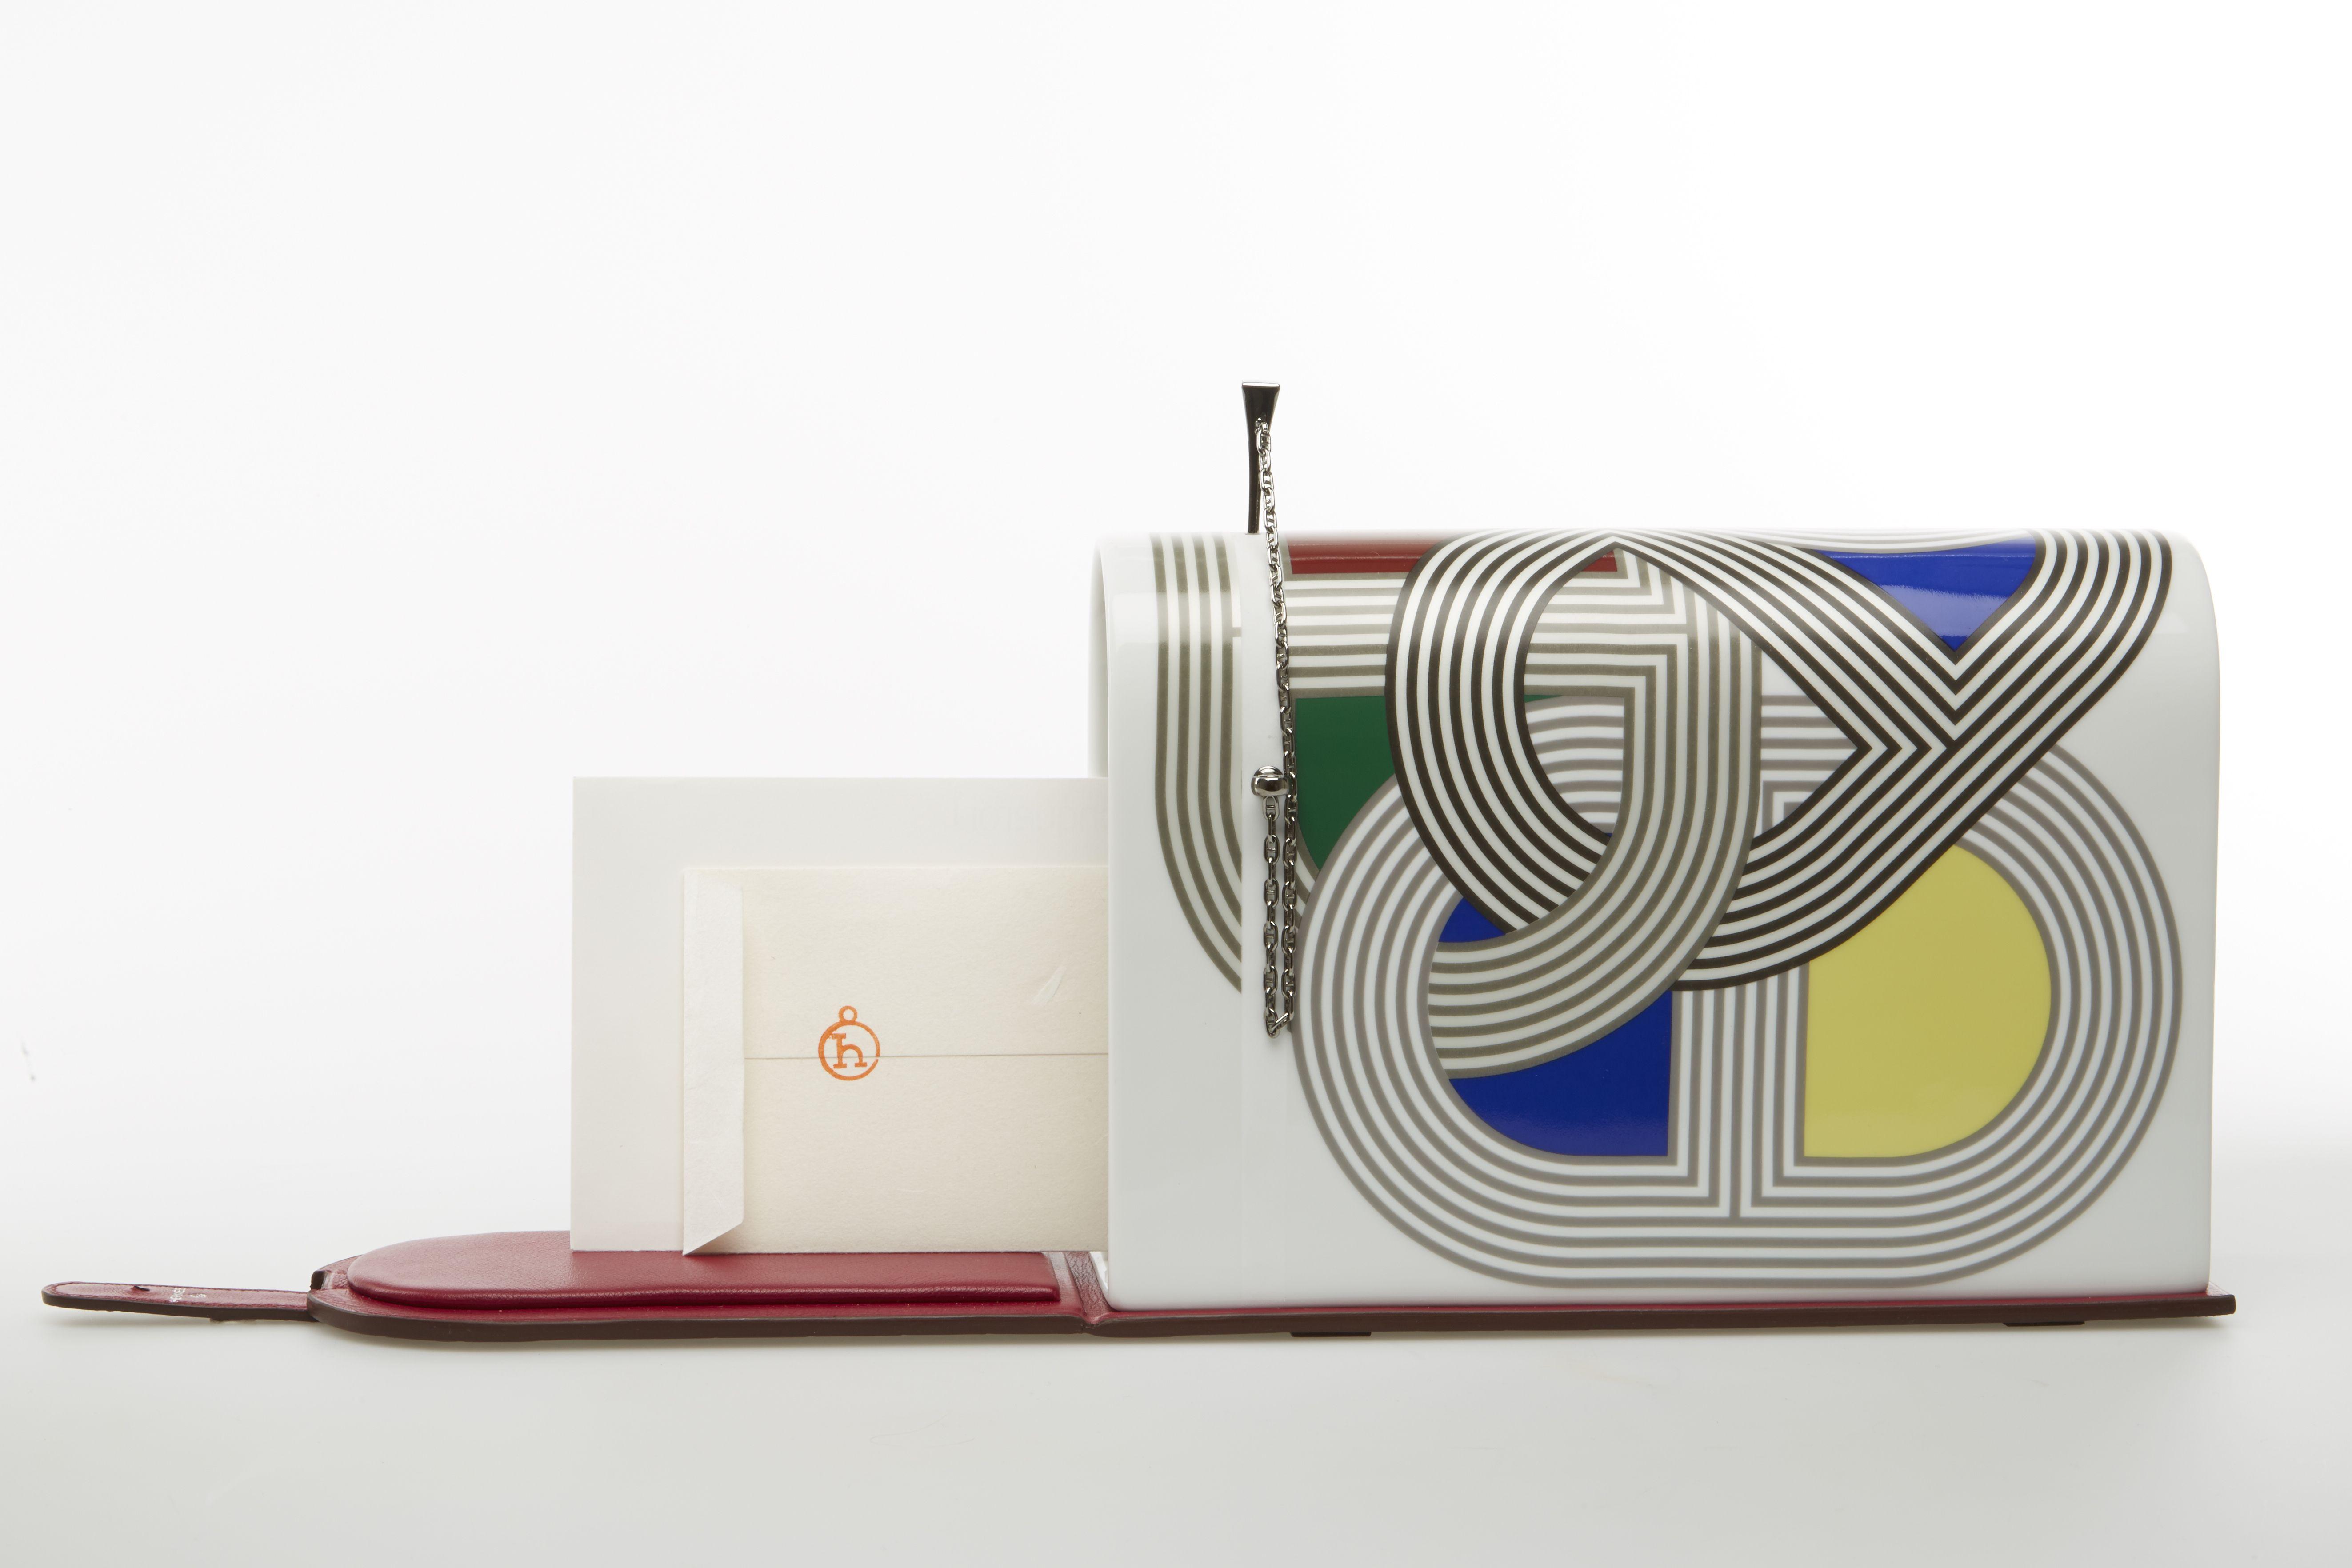 Hermès Petit h - Mail box #hermes #petith